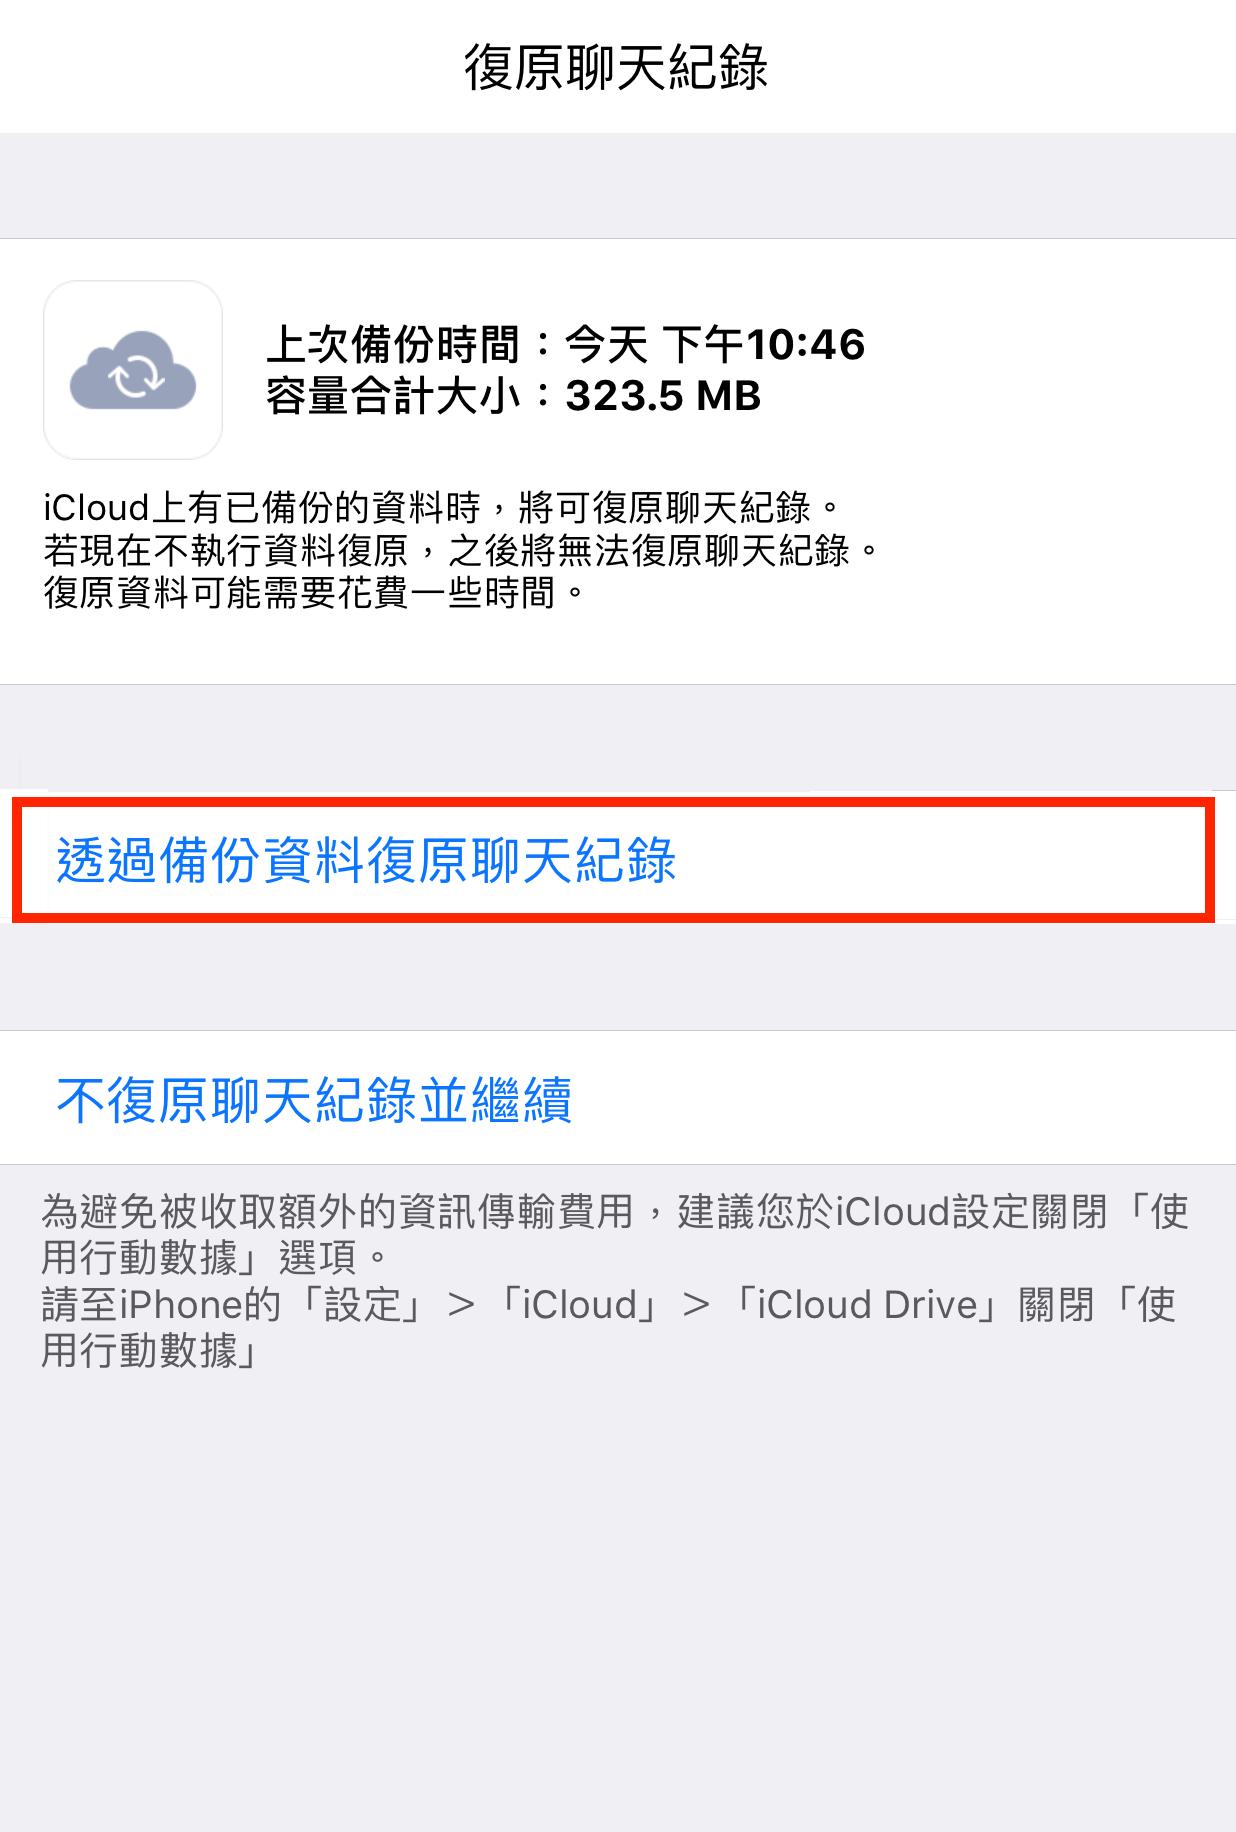 使用 iCloud 將 LINE 對話紀錄回復到新手機